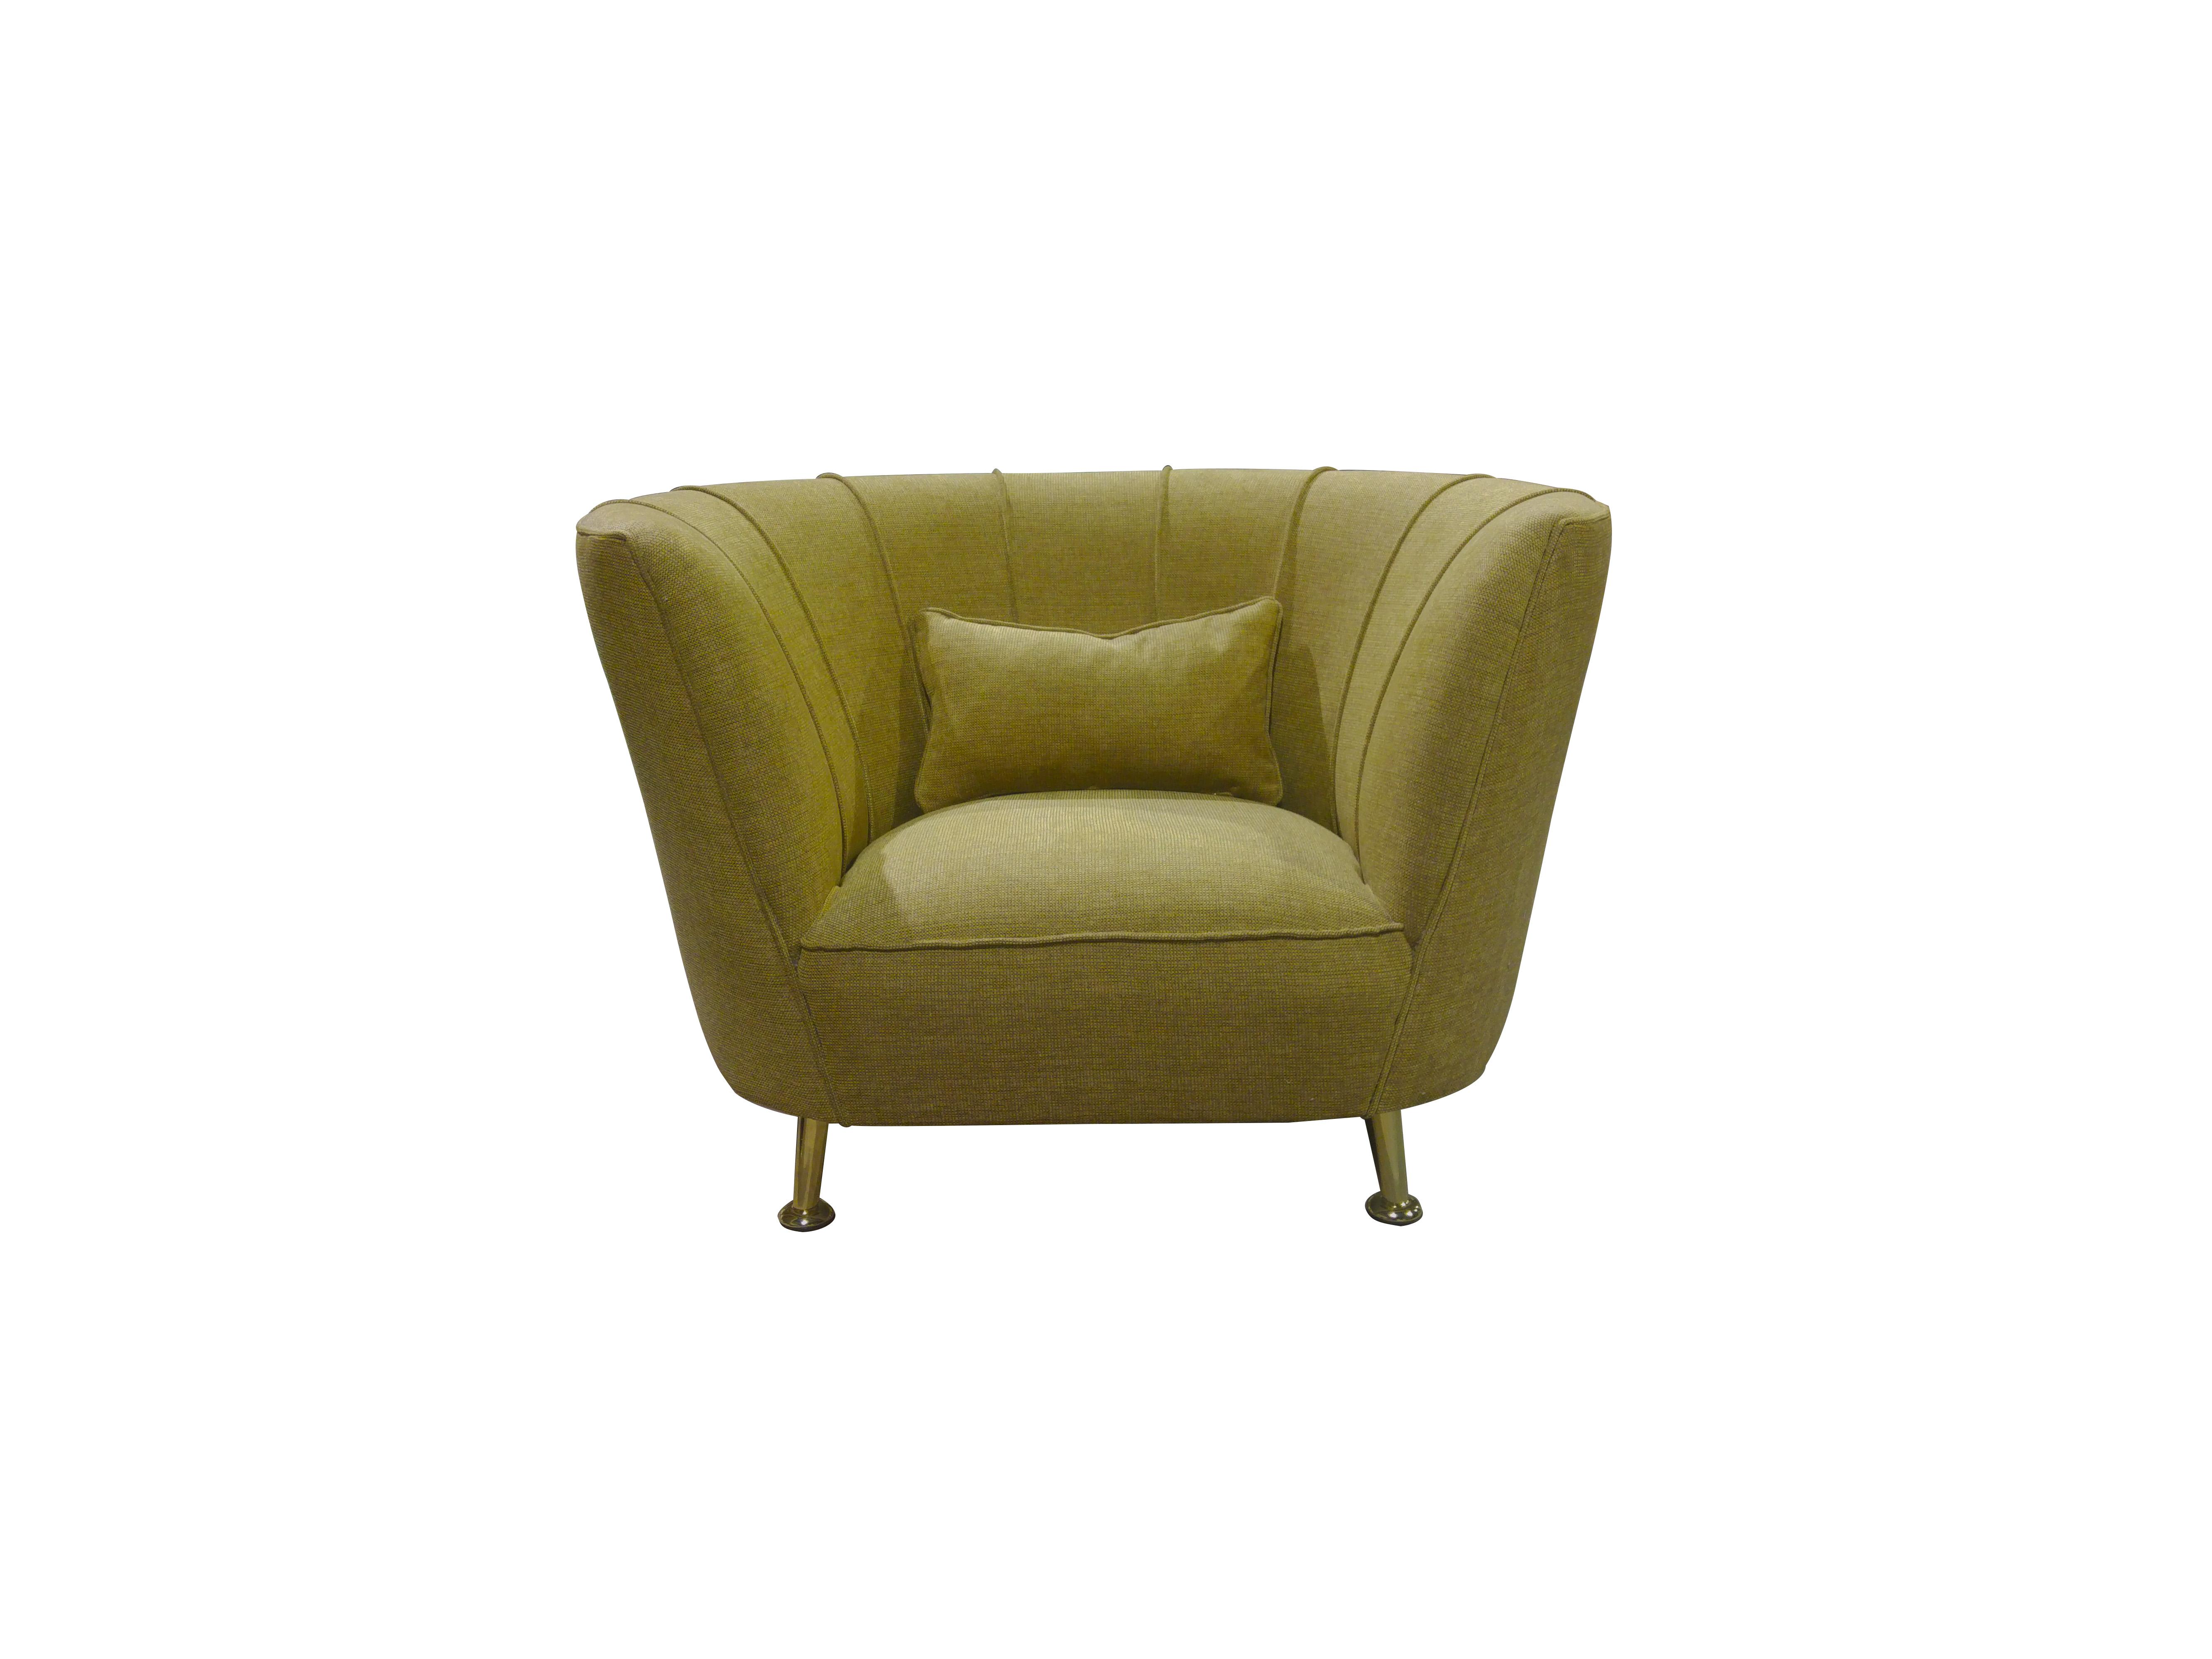 Hilton Chair Smaller